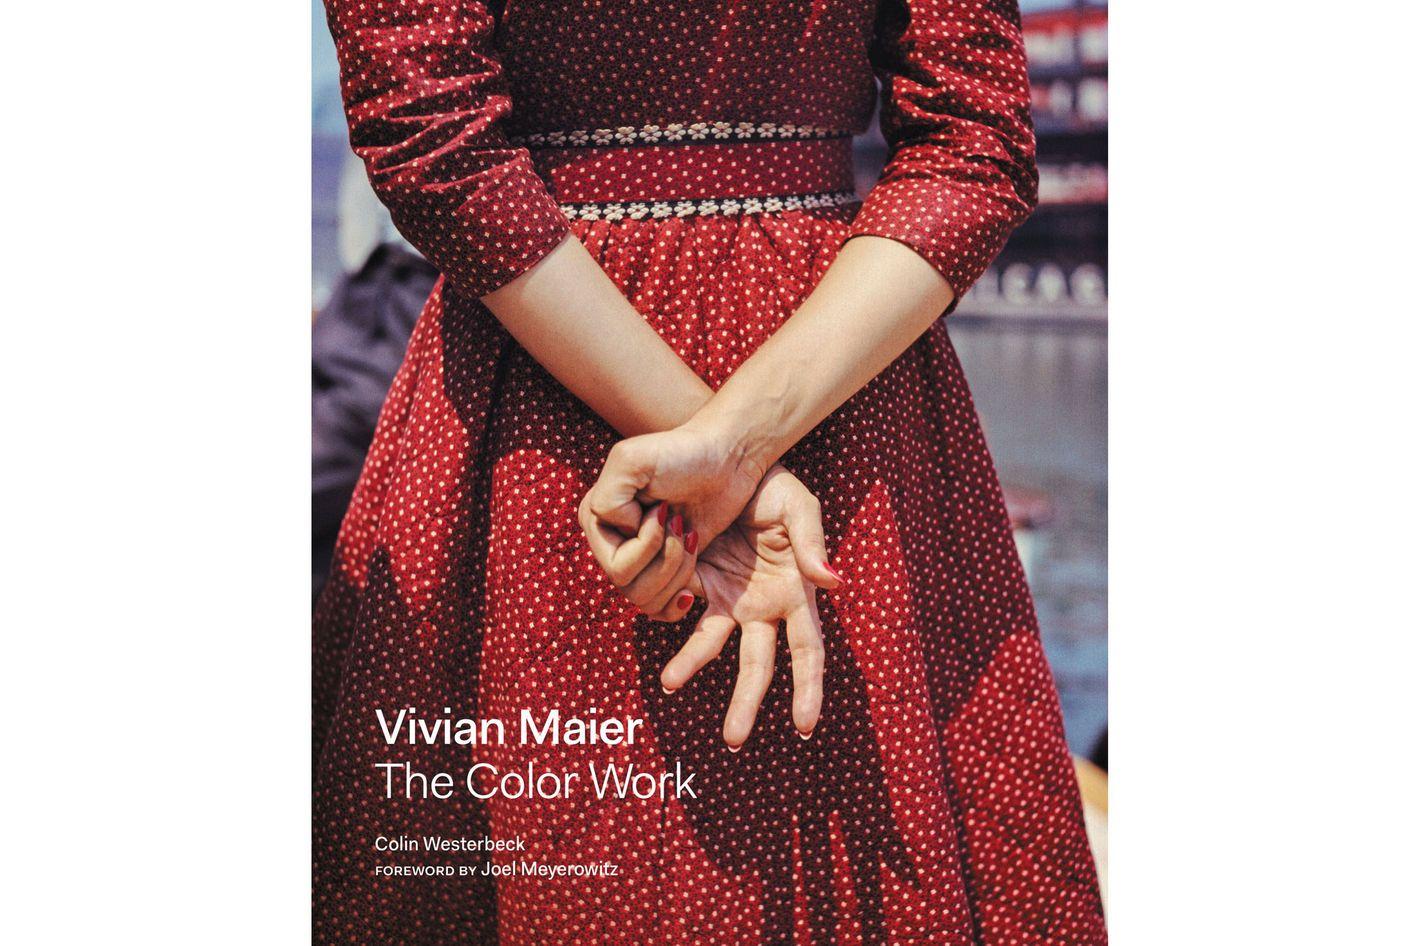 <em>Vivian Maier: The Color Work </em>byColin Westerbeck